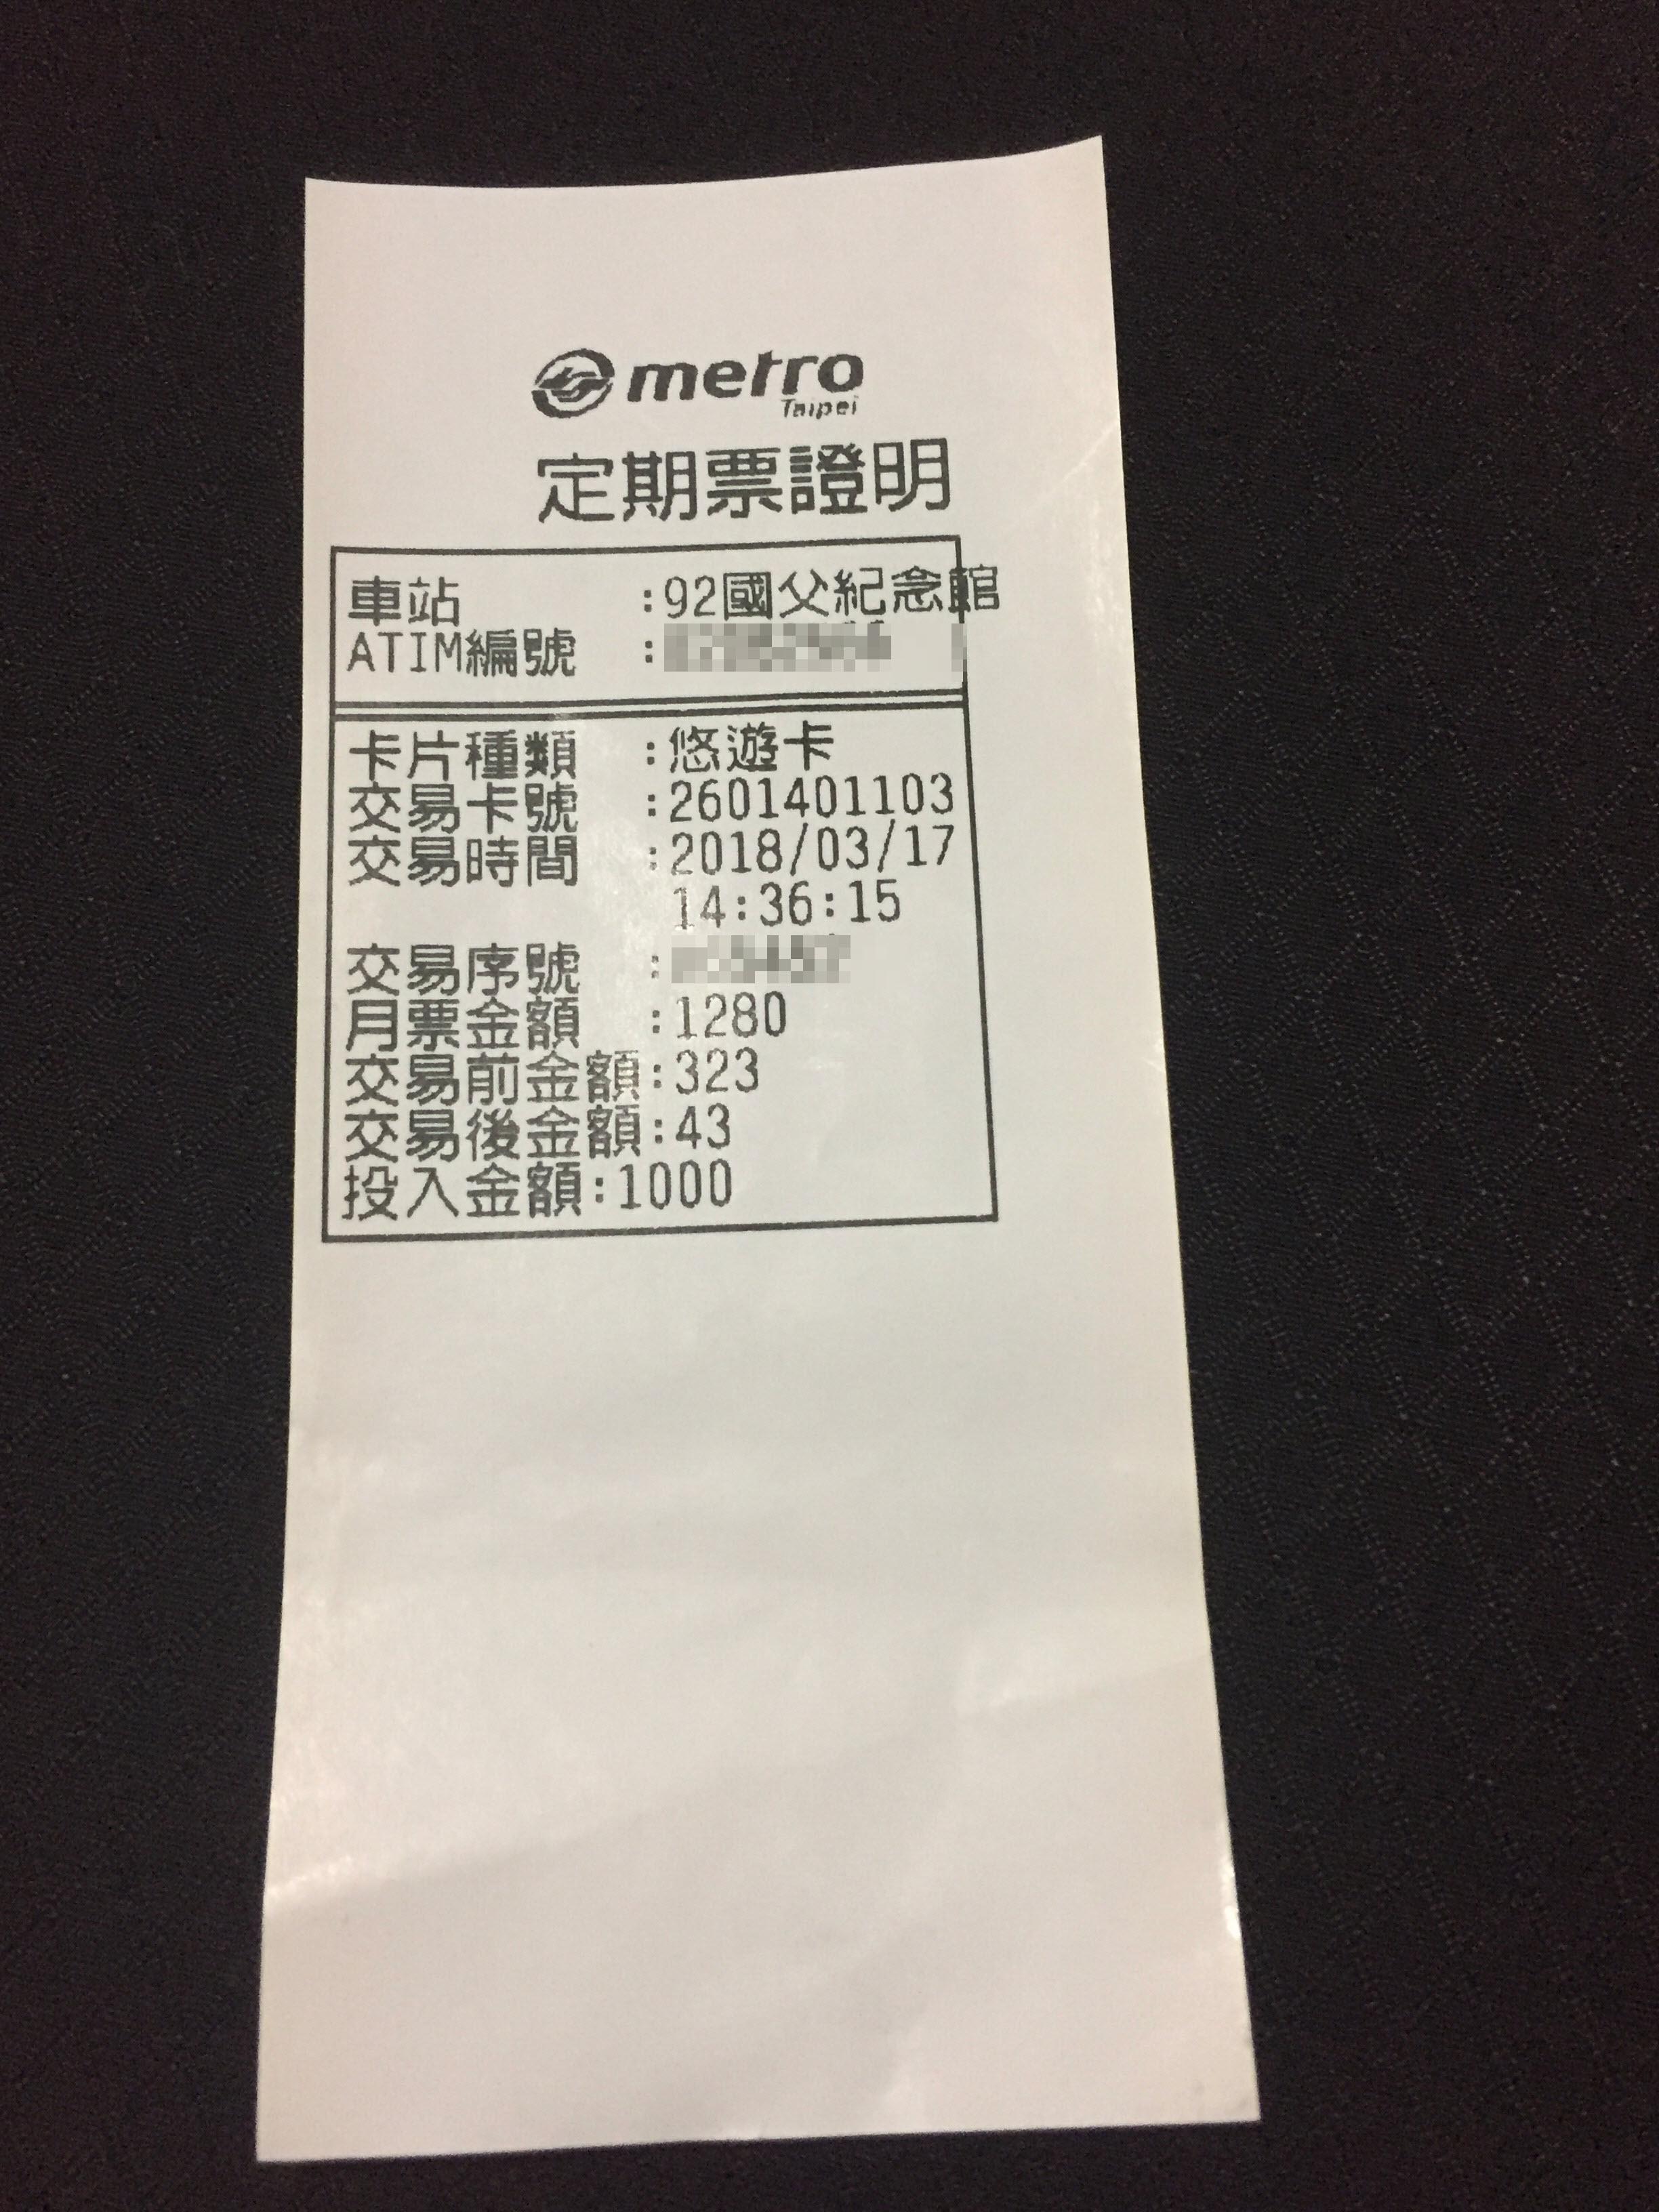 EasyCard-ticket-pass-11